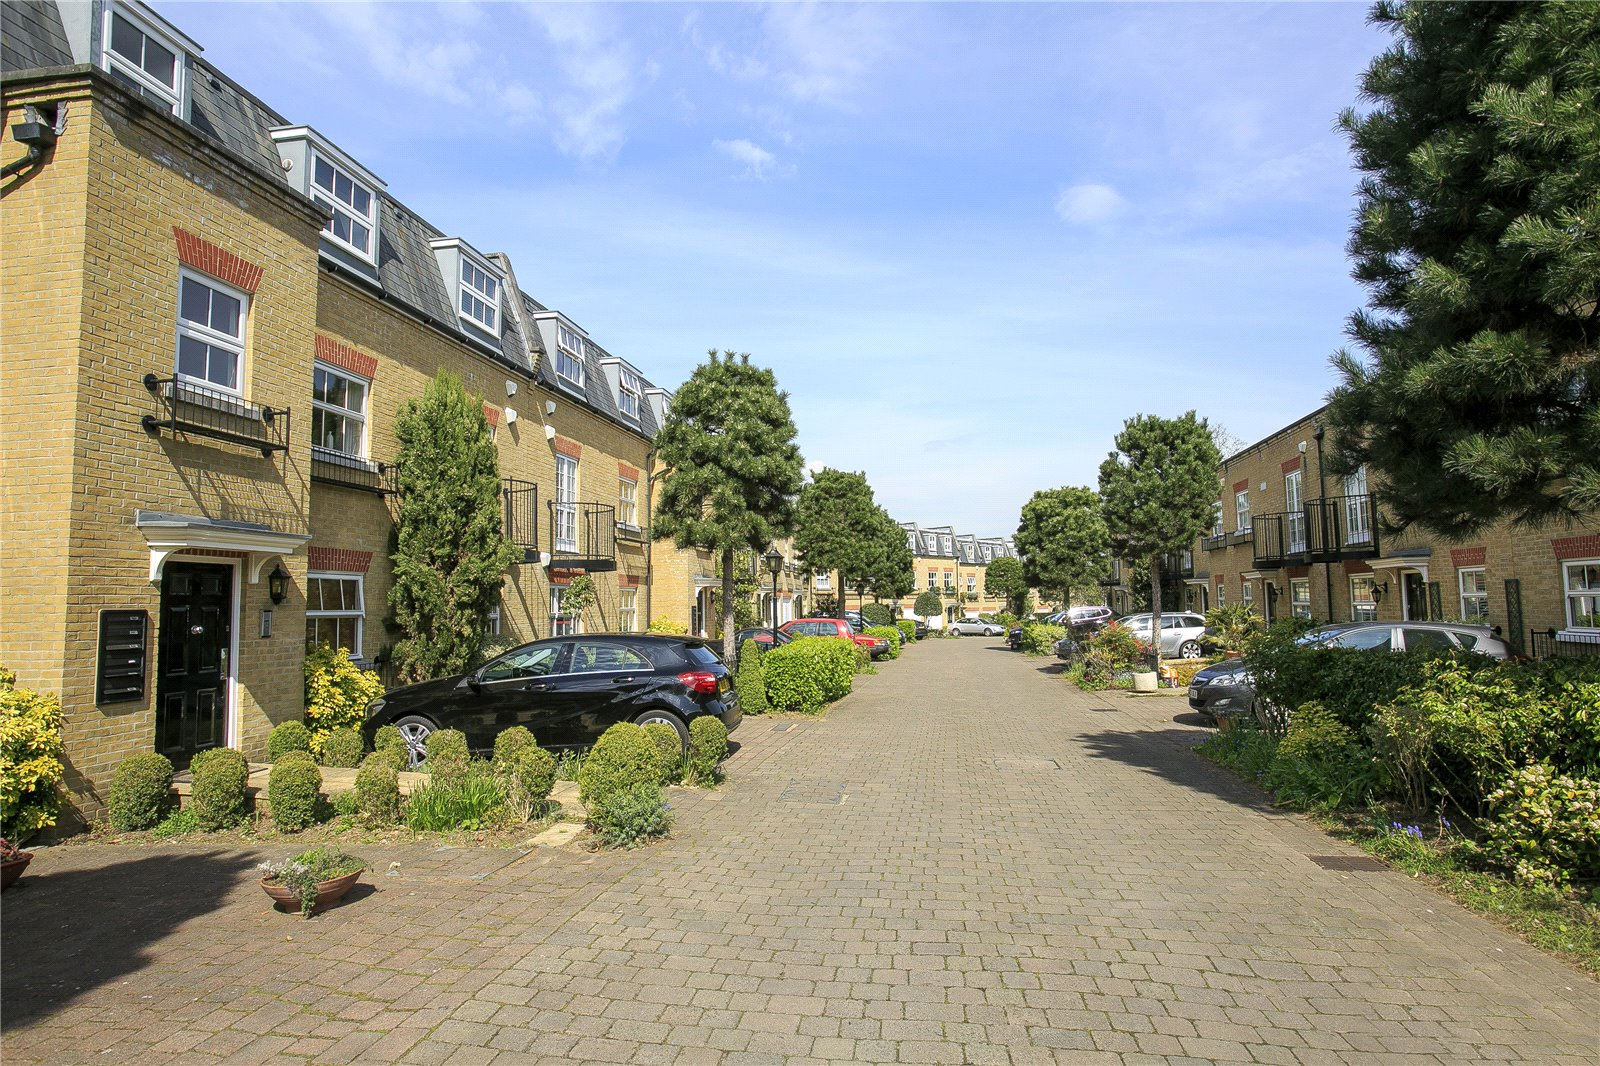 Layton Place, Kew, TW9 3PP - Antony Roberts